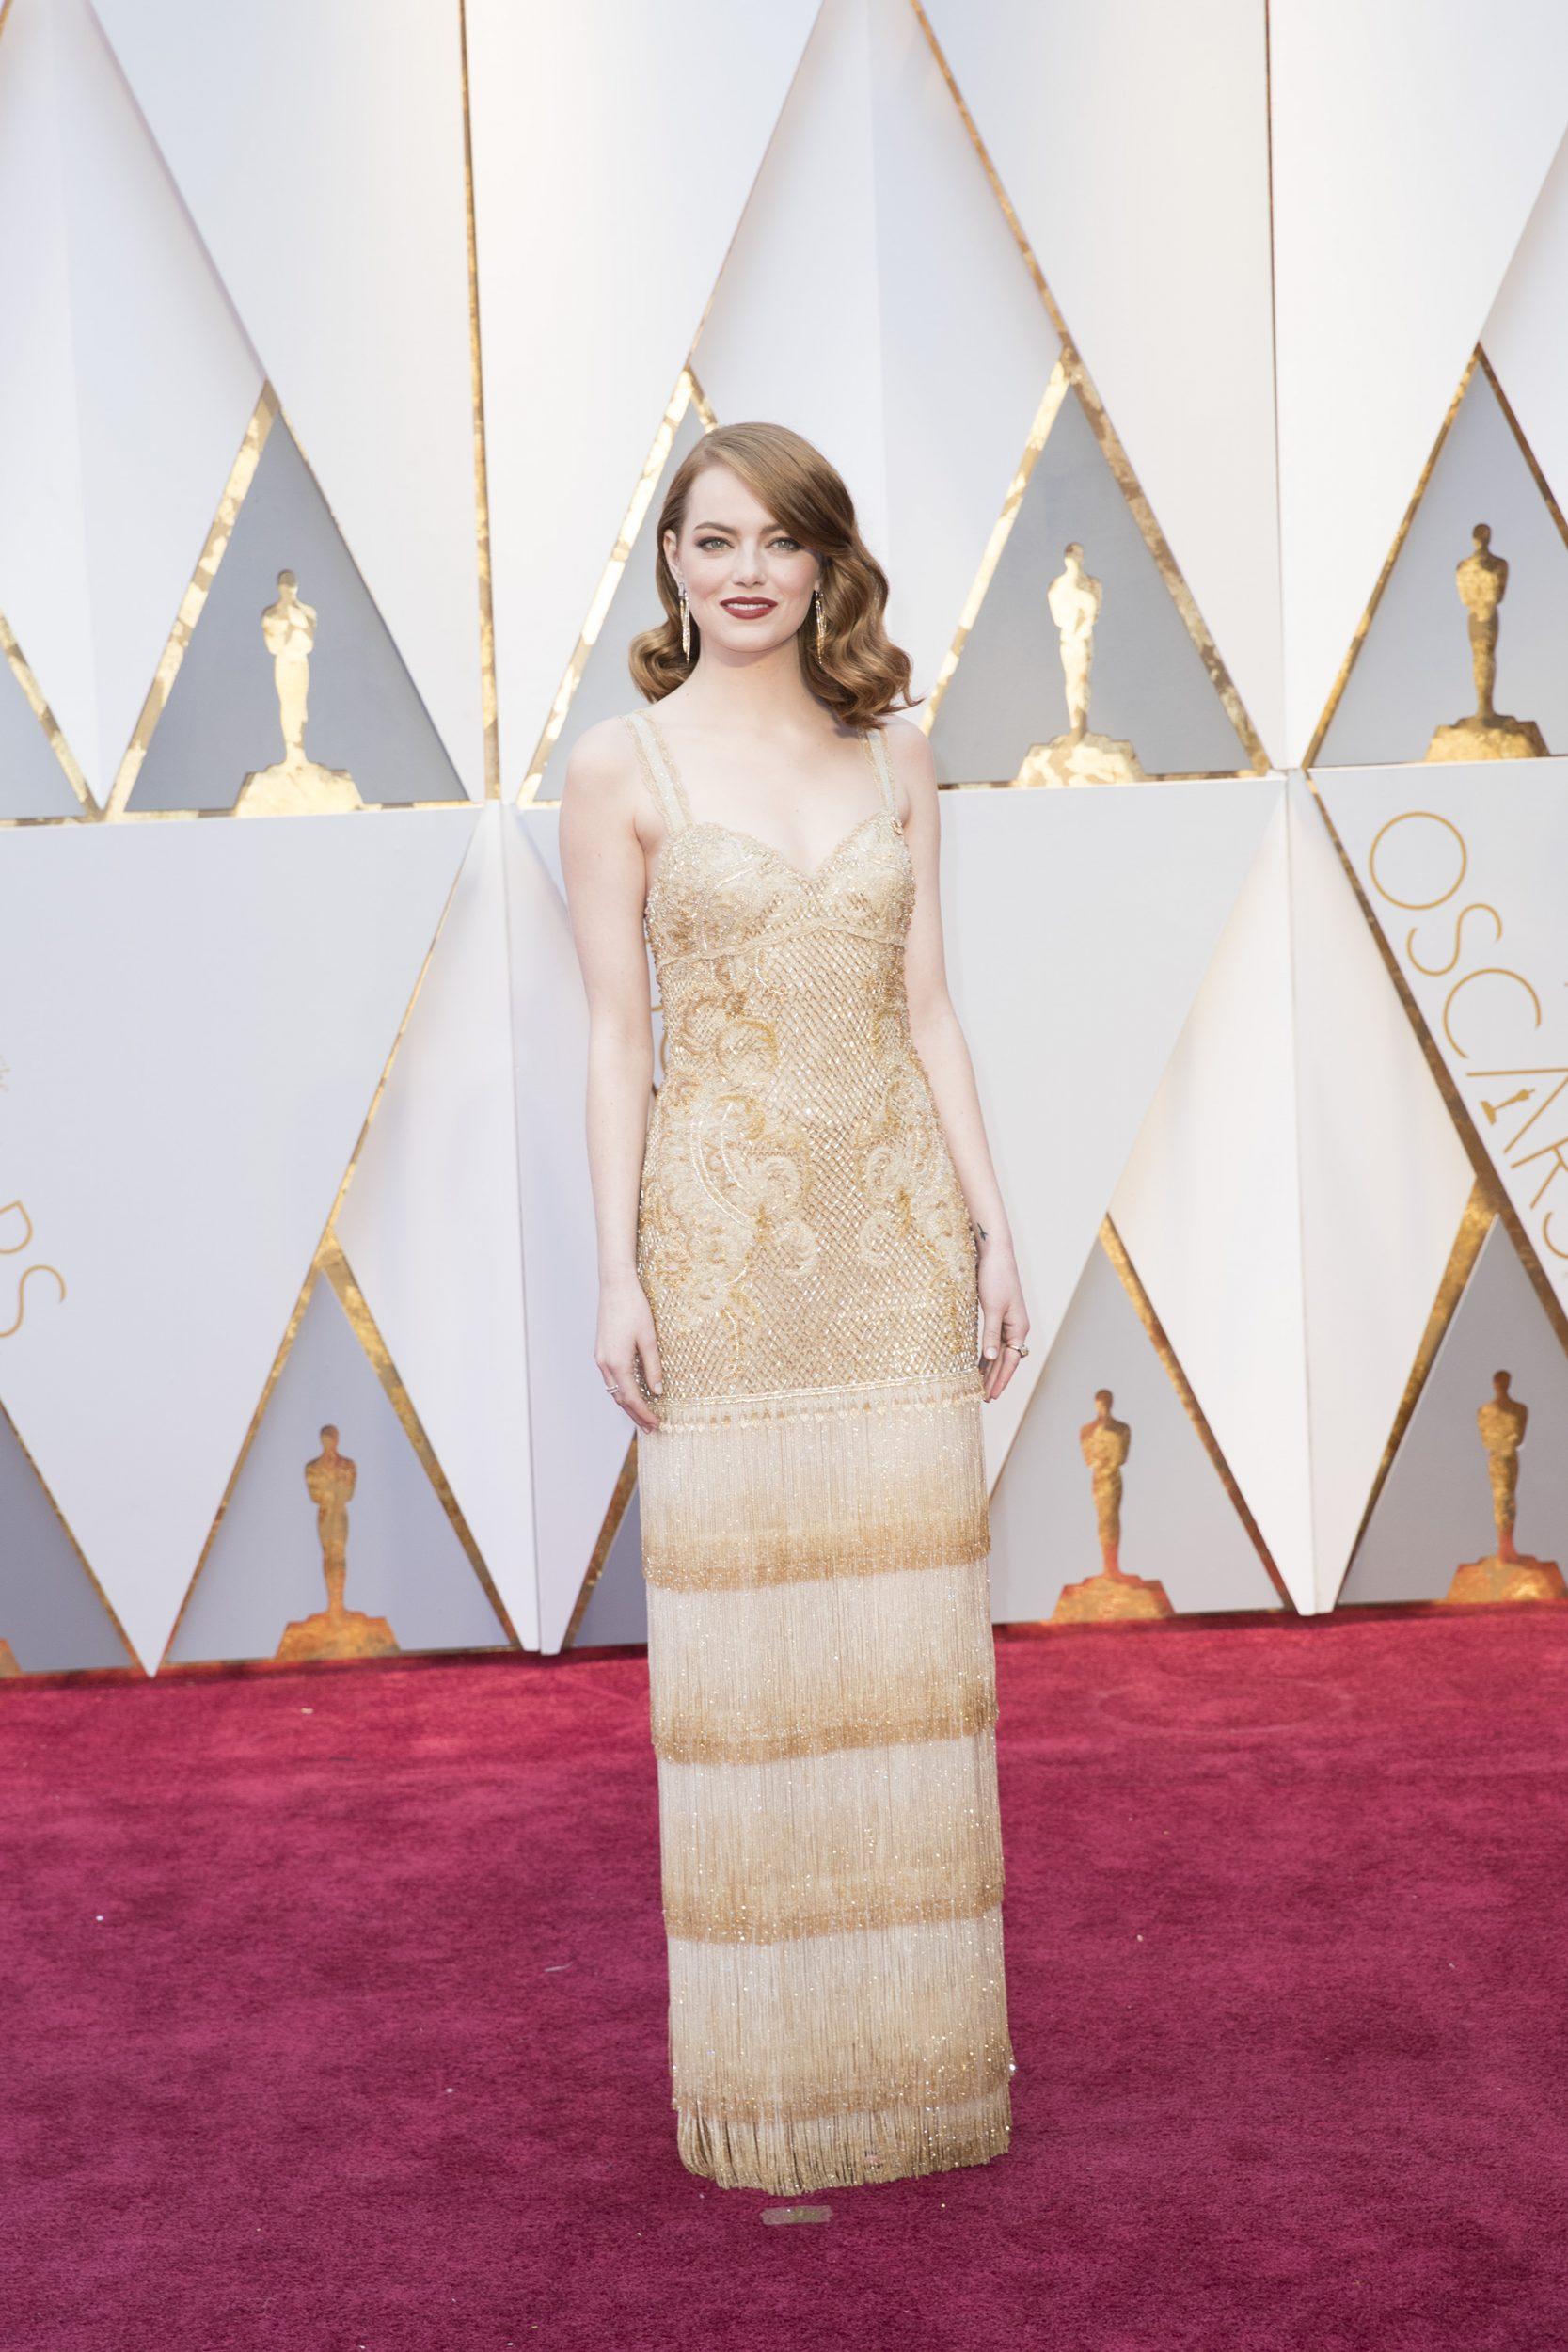 THE OSCARS(r) - The 89th Oscars(r)  broadcasts live on Oscar(r) SUNDAY, FEBRUARY 26, 2017, on the ABC Television Network. (ABC/Tyler Golden) EMMA STONE